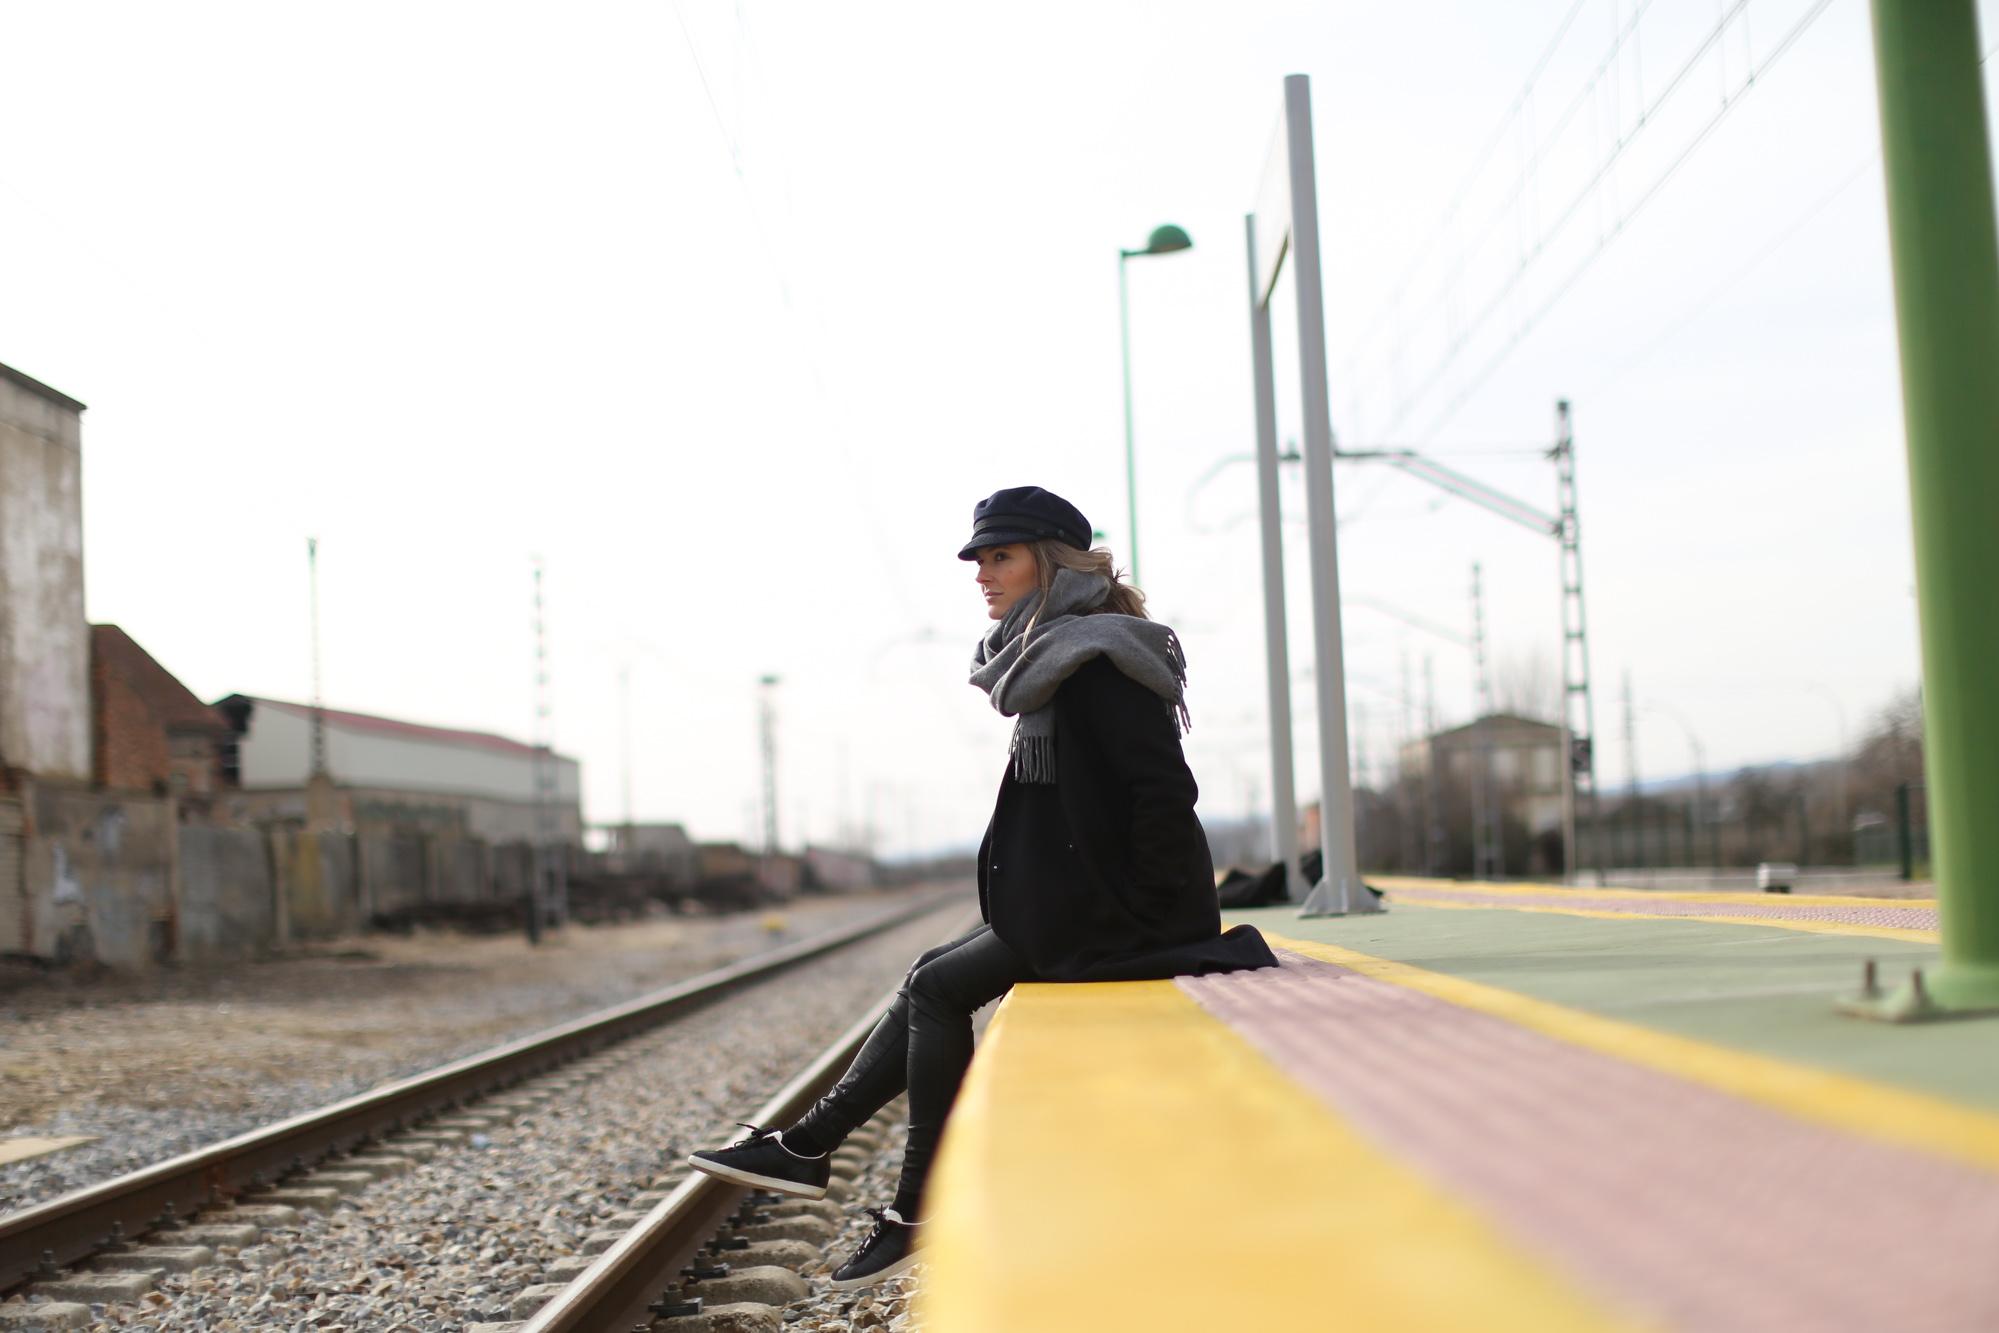 Clochet_streetstyle_cos_coat_saint_james_hat_adidas_gazelle-1-4